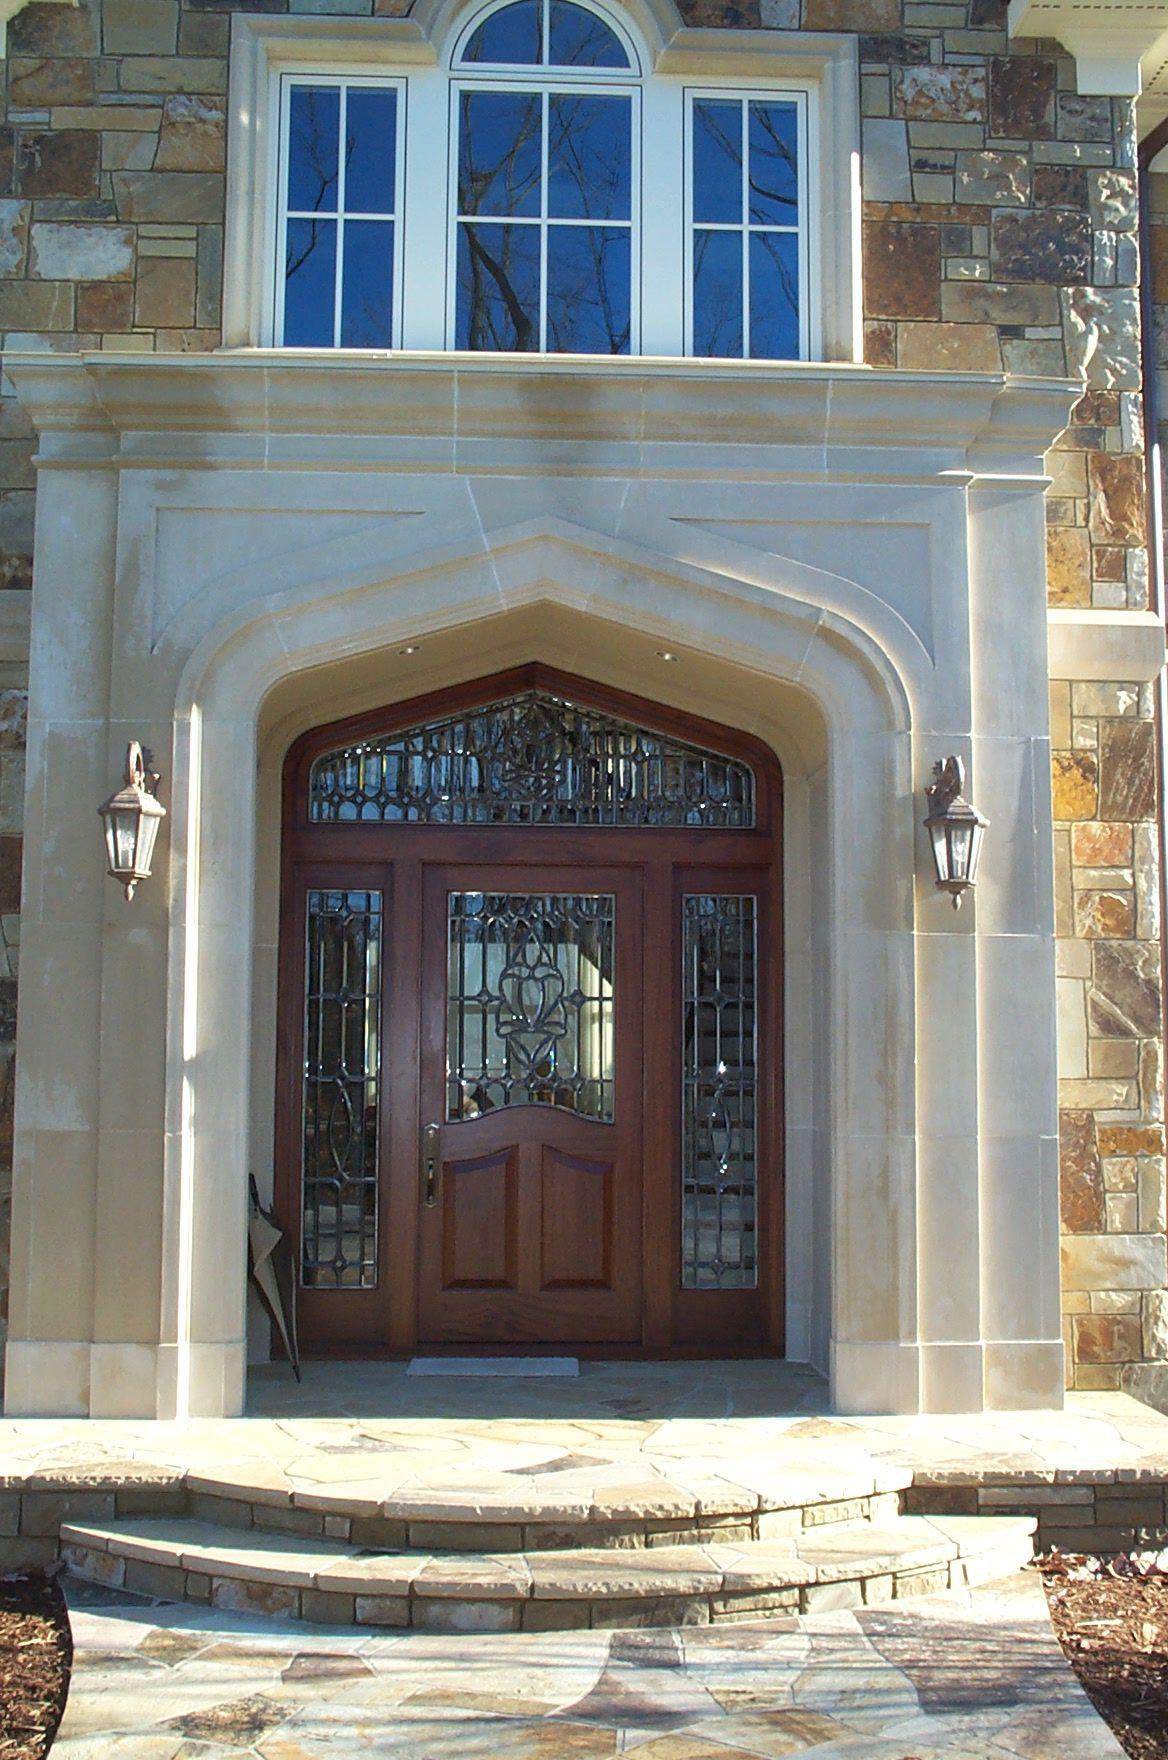 Cast Stone Surrounds Door Large Window Above Illuminates Entry Area Inside House Design Large Windows Mexico House